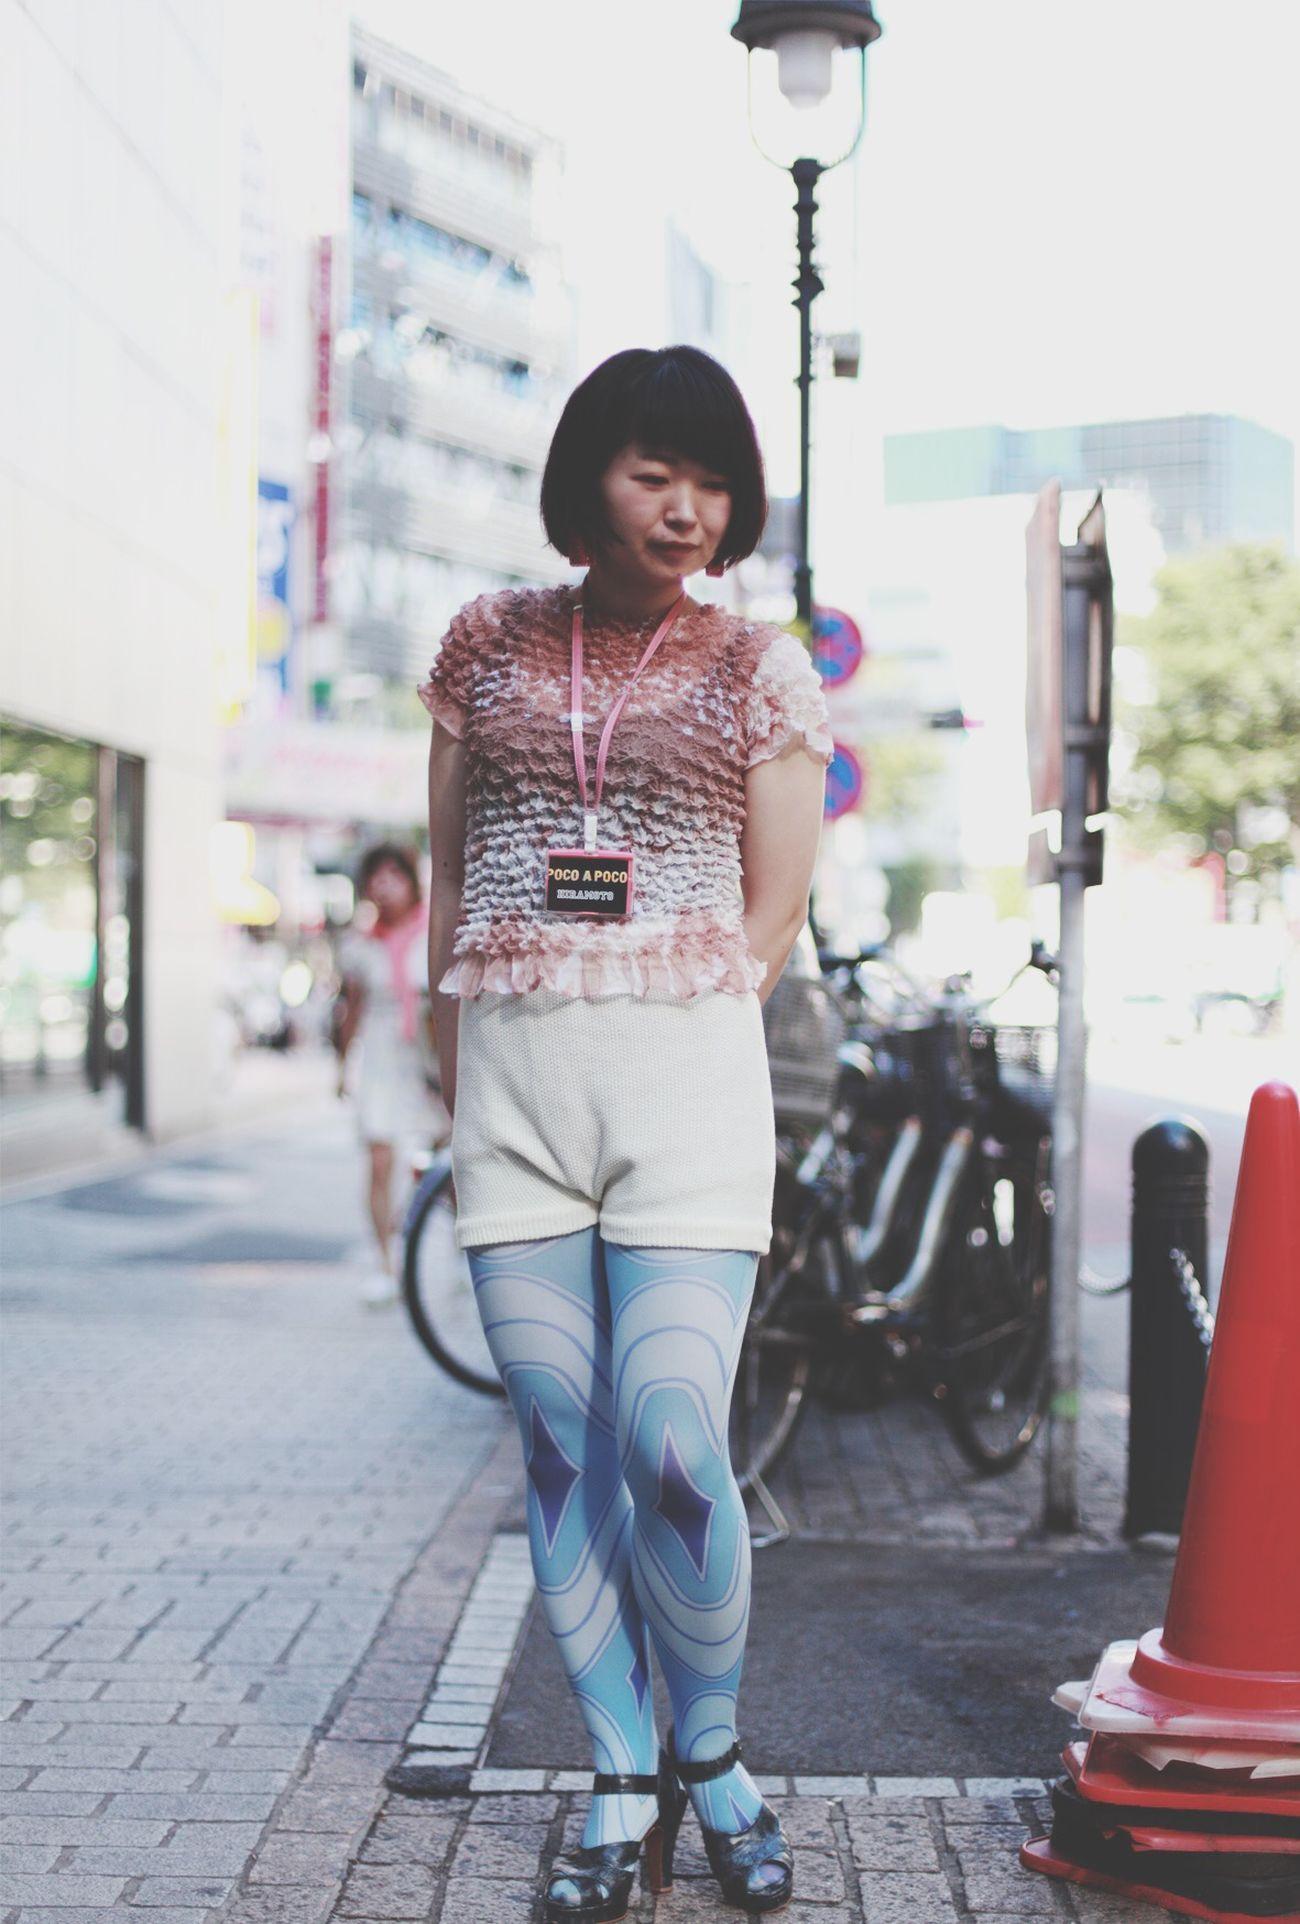 Pocoapoco ぽこあぽこ Tights タイツ Shibuya 渋谷 Houseofholland